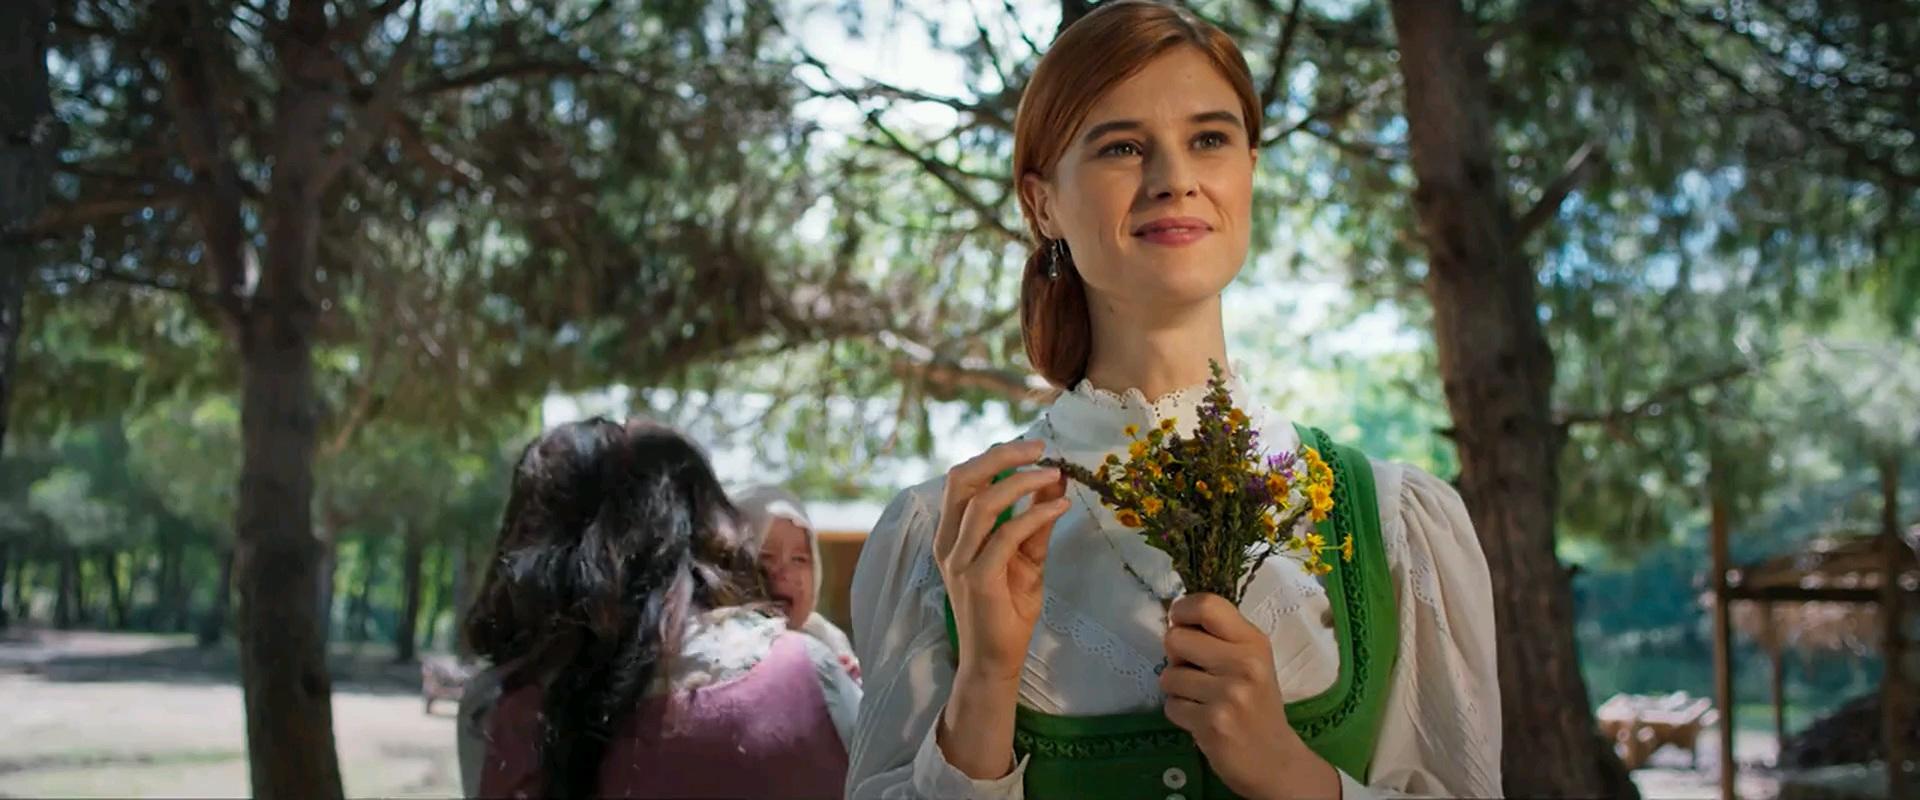 Türk İşi Dondurma | 2019 | Yerli Film | NF | WEB-DL | XviD | Sansürsüz | 1080p - m720p - m1080p | WEB-DL | Tek Link